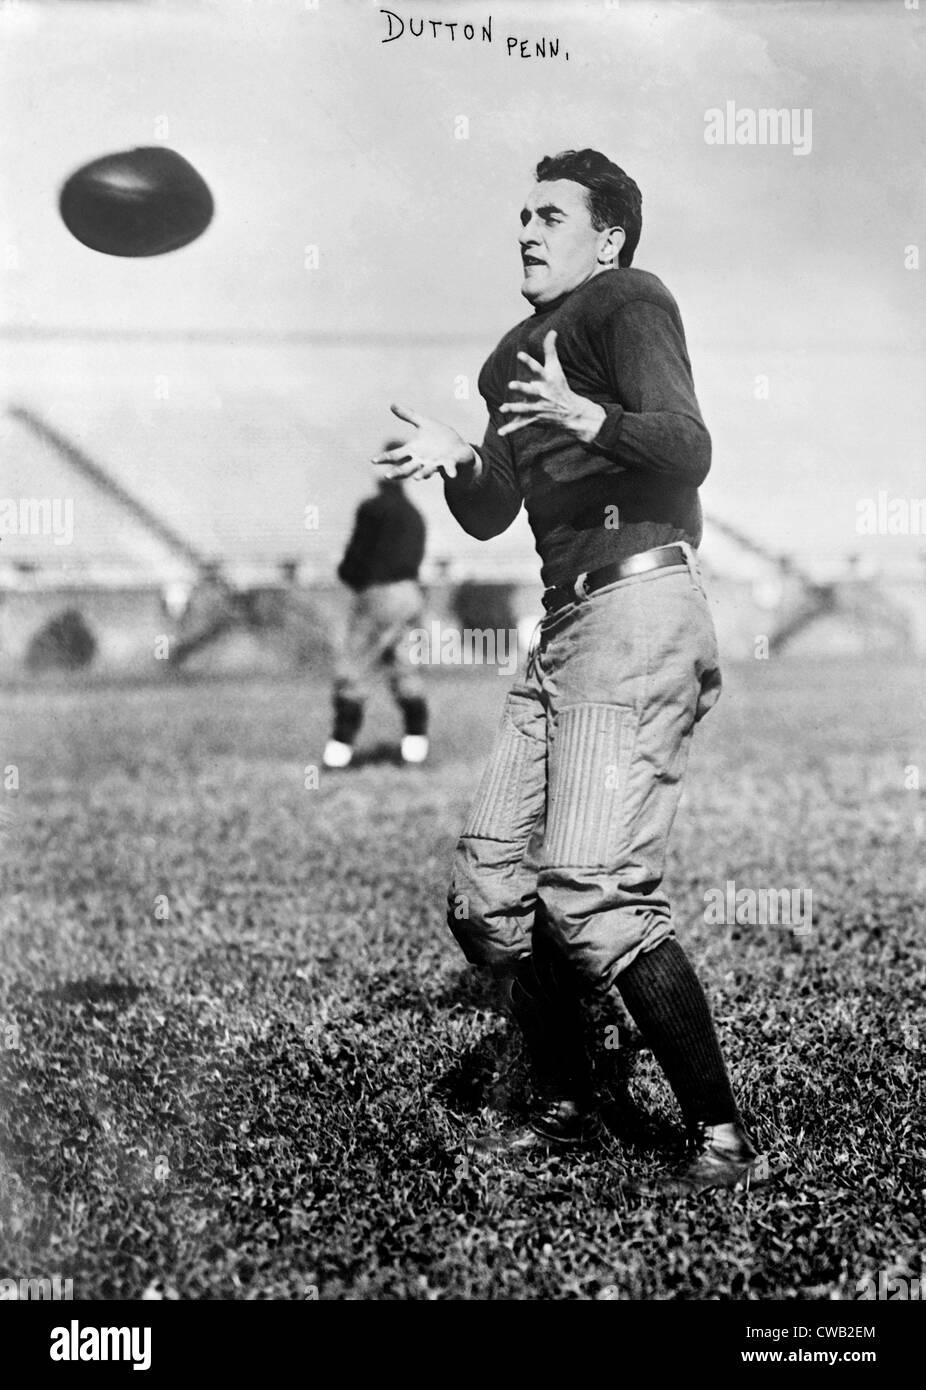 Calcio, Dutton, University of Pennsylvania, circa 1910-1915. Immagini Stock